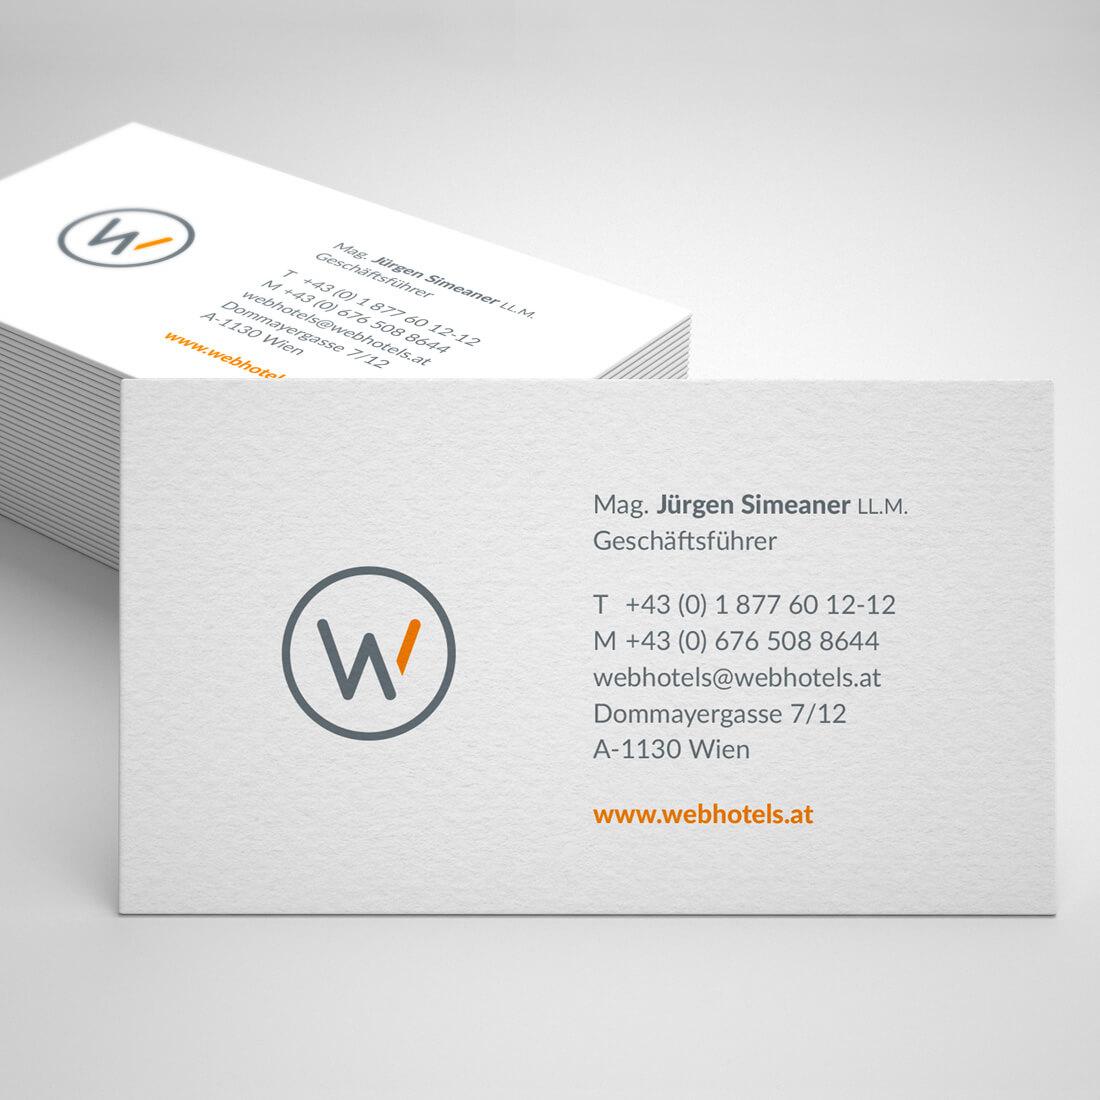 barbara tabery jalun design graphic design corporate design branding webdesign annua report barcelona vienna valencia mallorca corporate design german logos web pages art director xativa